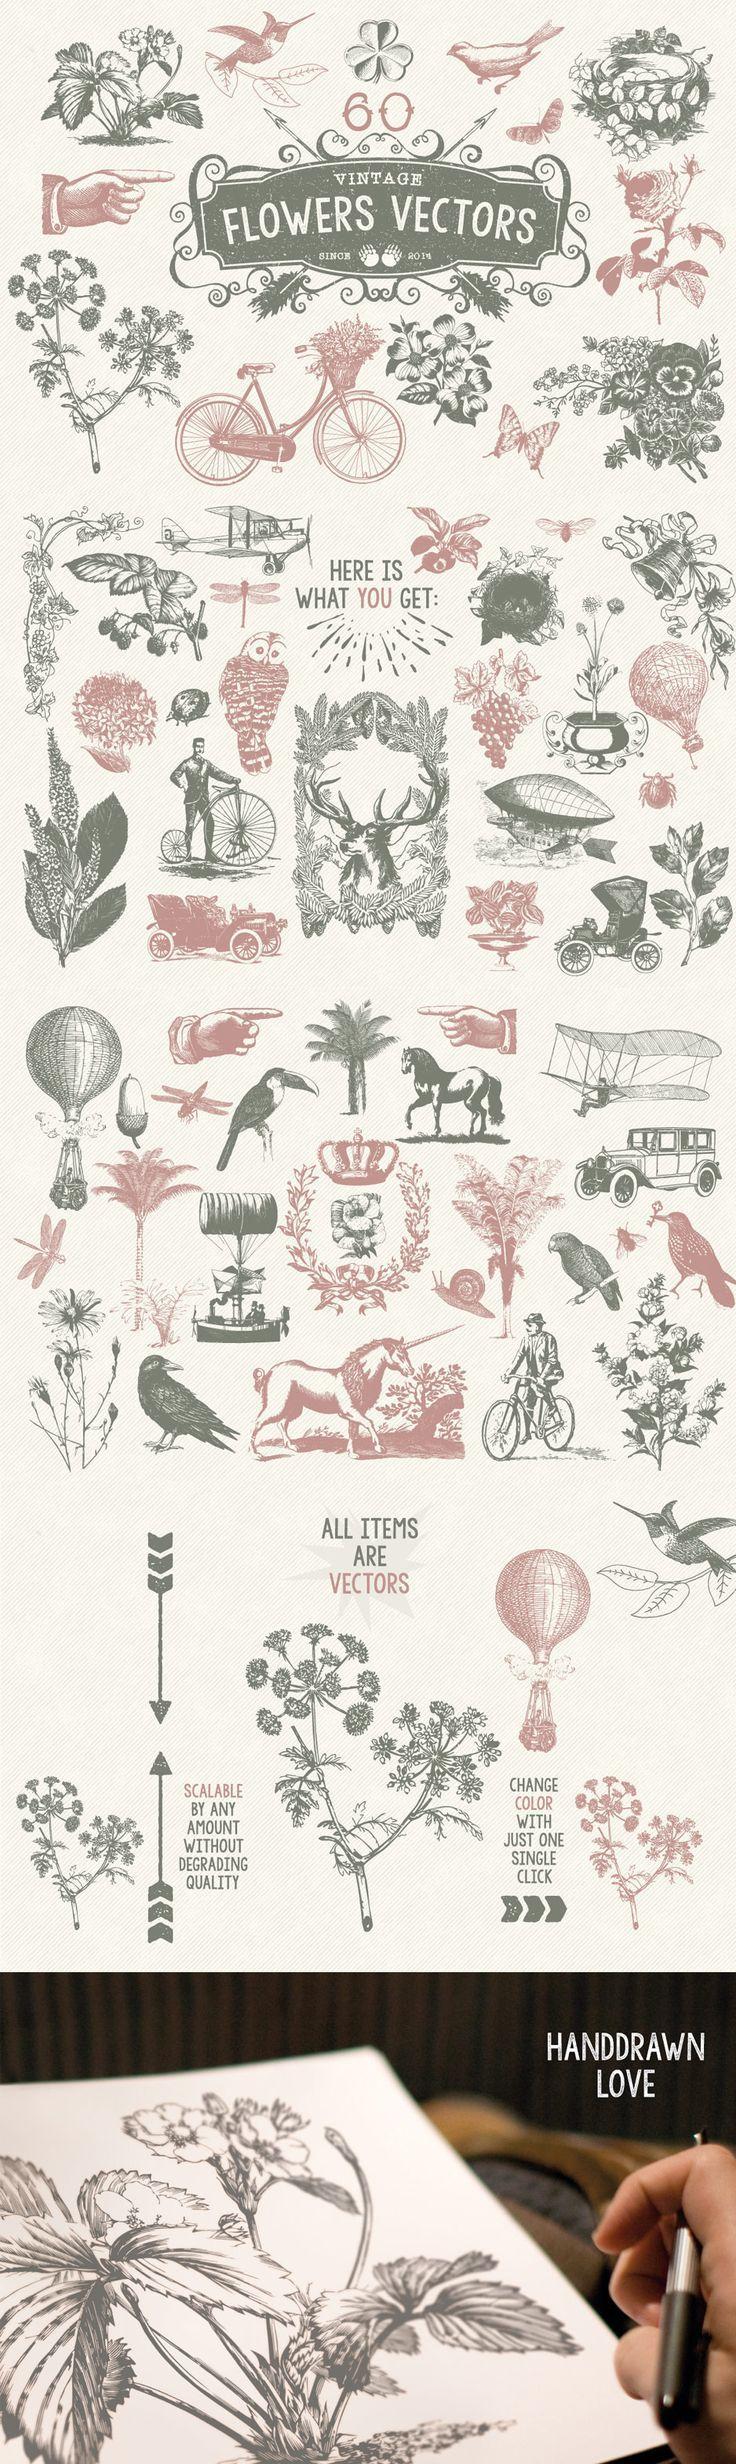 Typography  60 Vintage Flower Vectors by MouseMade   The Comprehensive Creative Vectors Bun